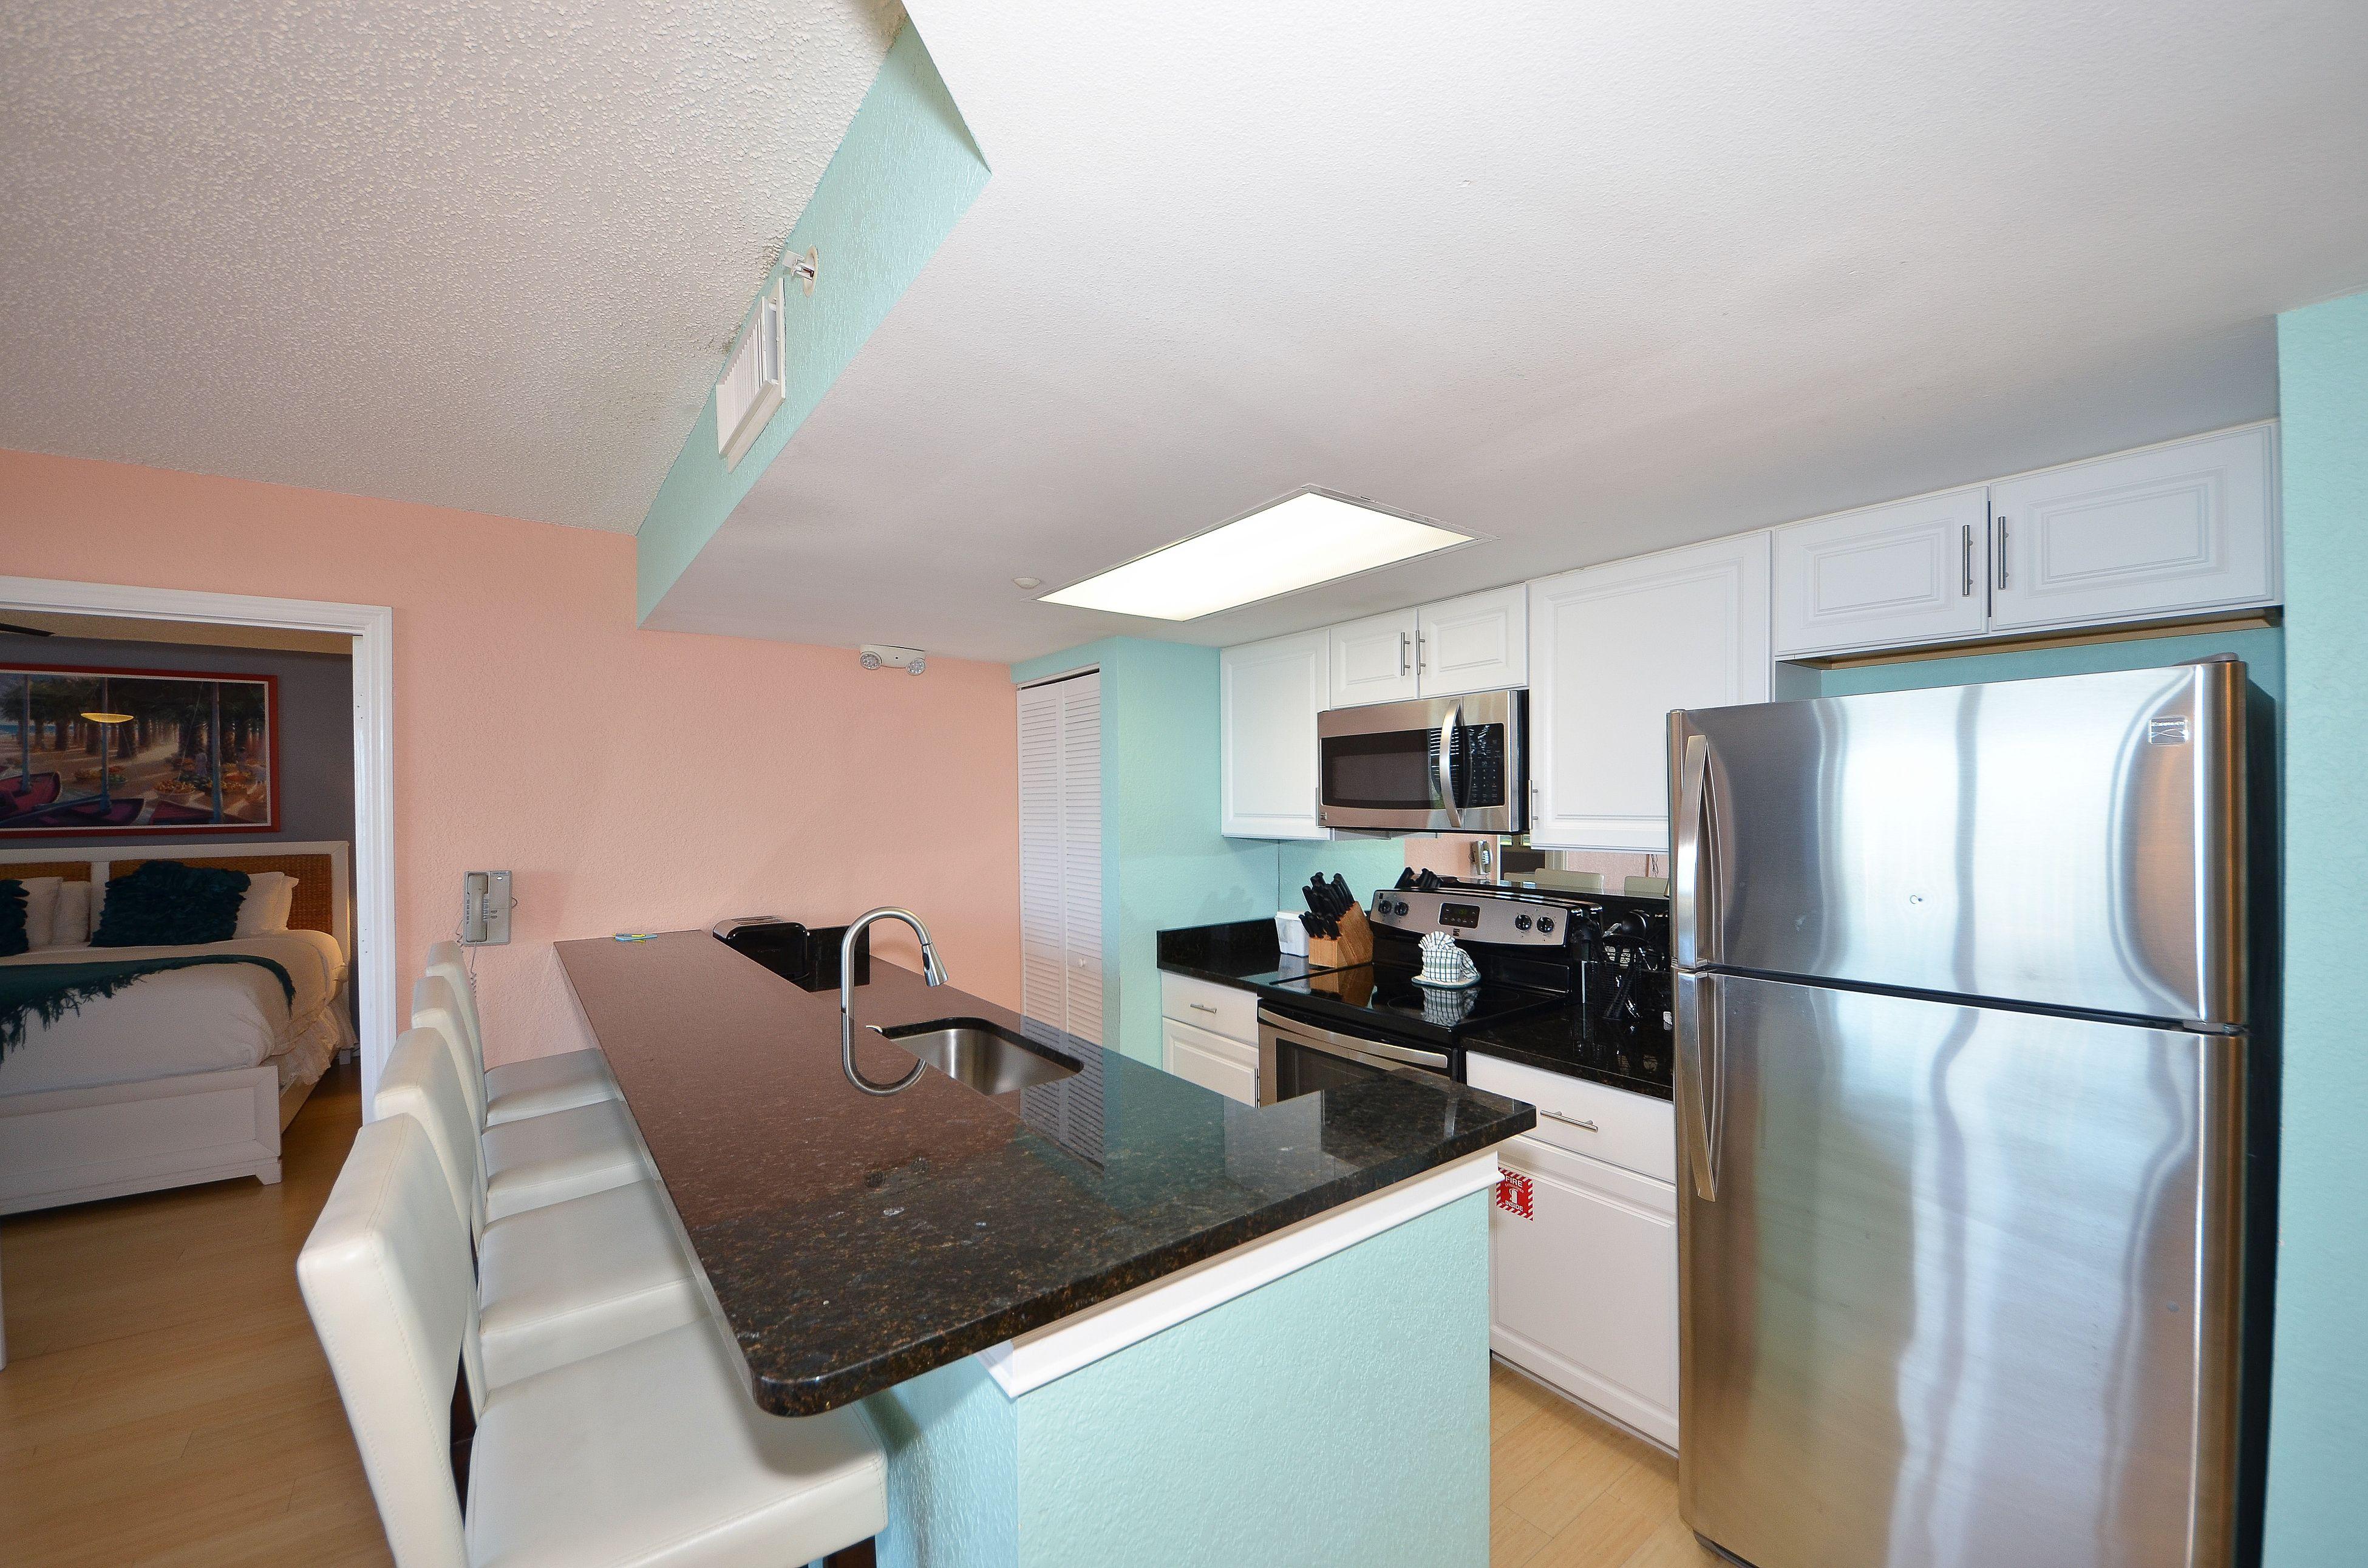 The Atlantic Grand Oaks Rentals 3 bedroom 1 bath house plans round